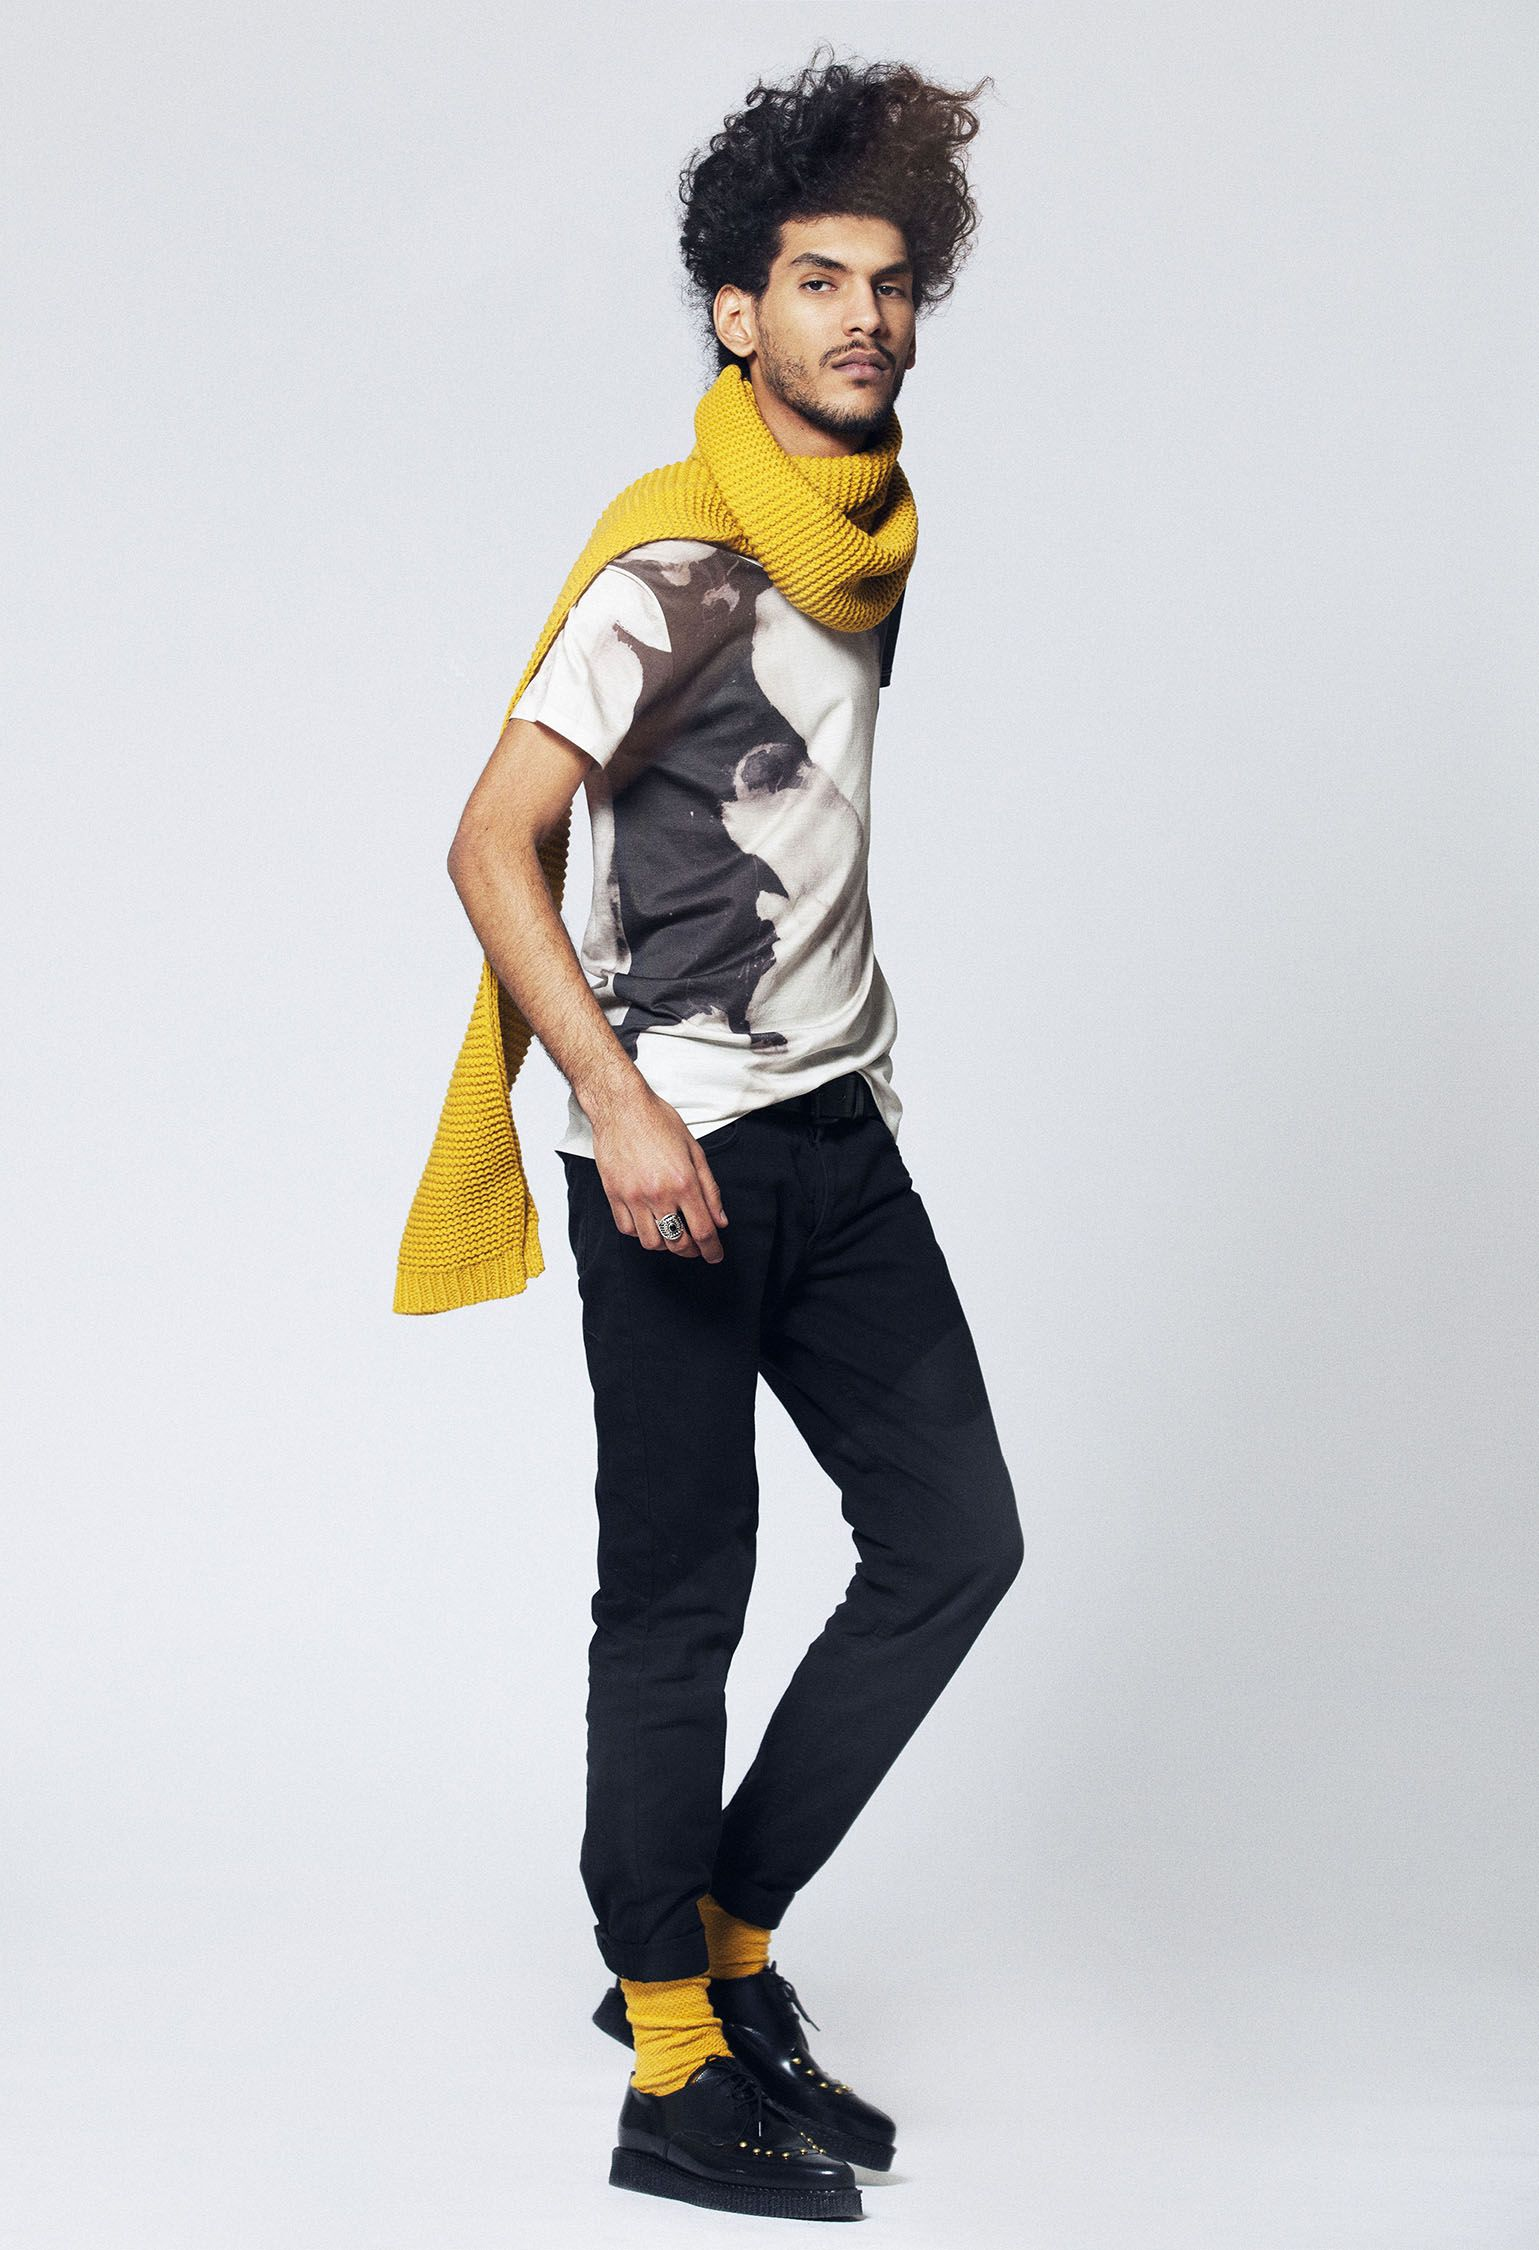 T-shirt Abîme - pour homme - marque Boys don't cry / Men's t-shirt - Boys don't cry brand